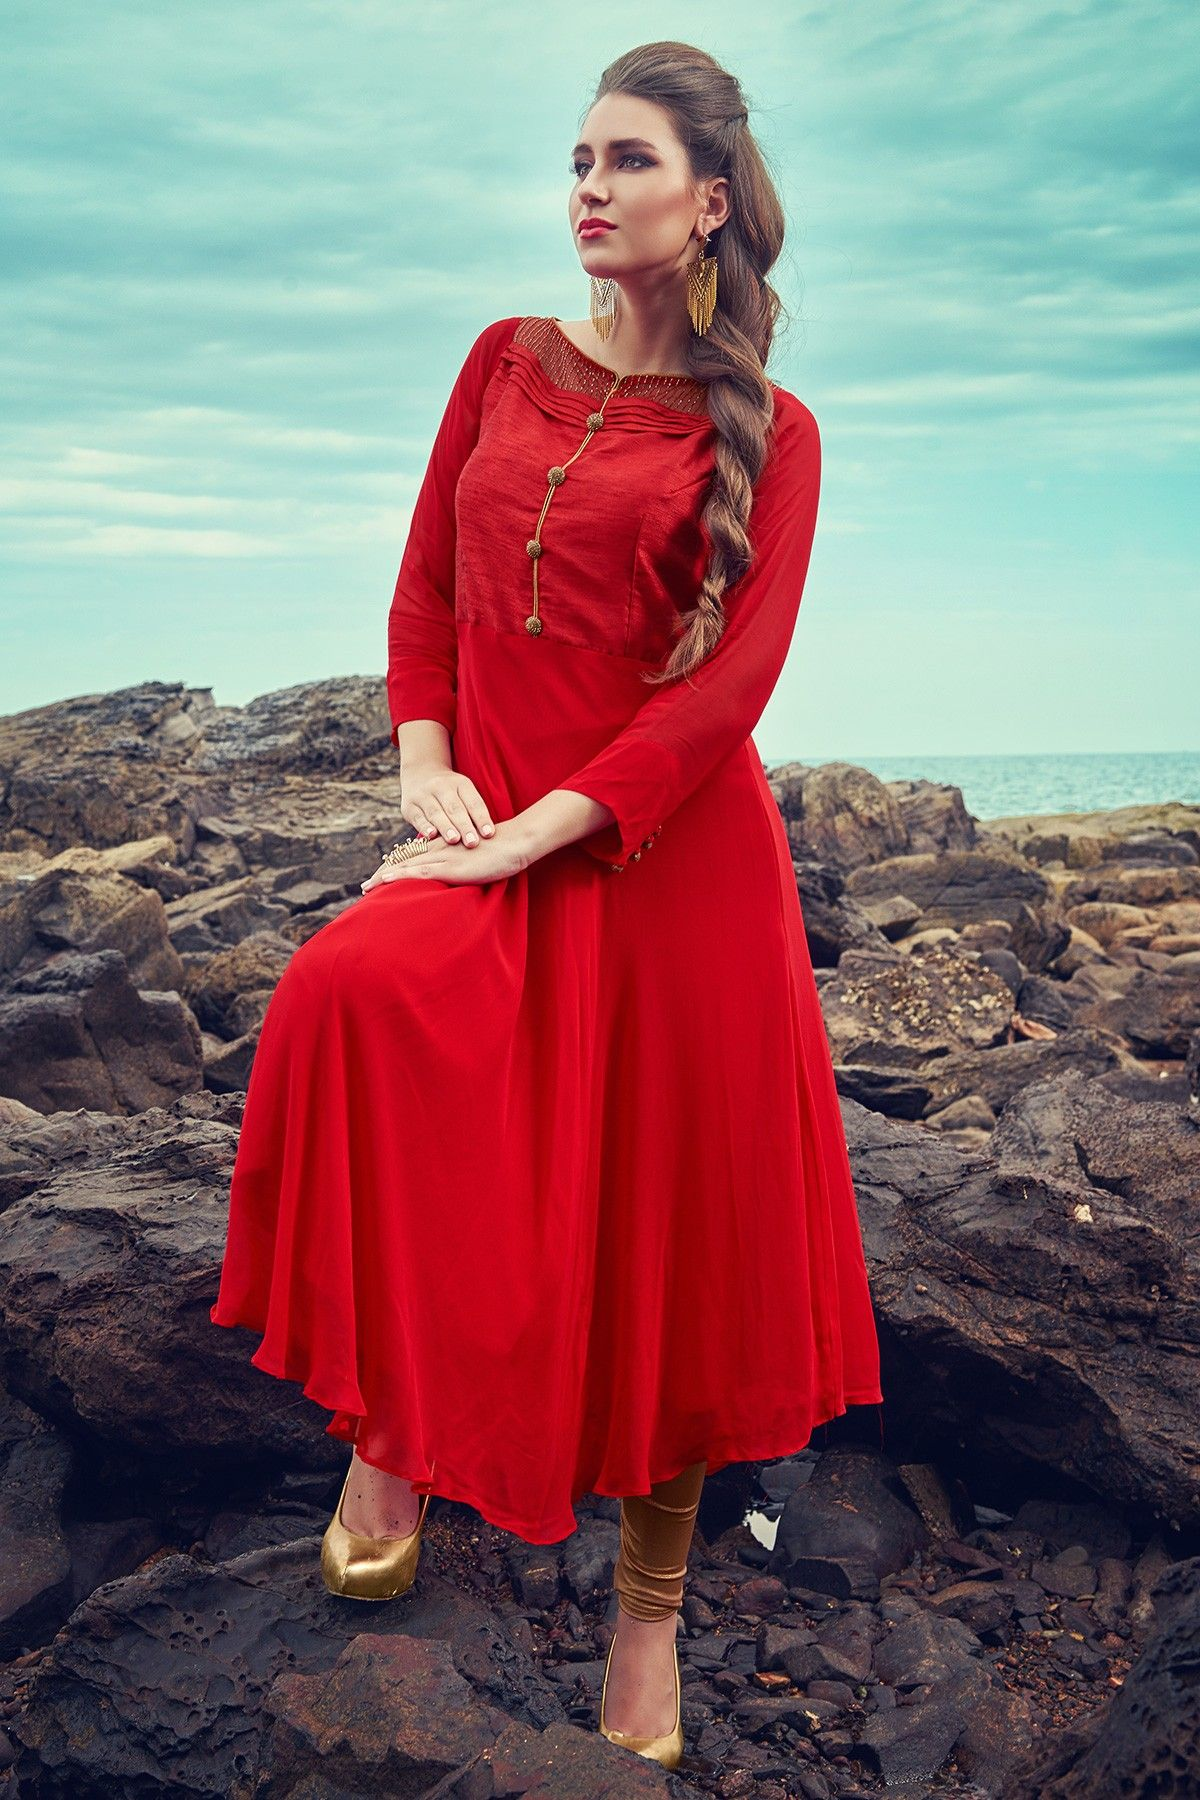 e7c3361dcdcd Red classy umbrella cut georgette kurti with Boat neck-WKR368 - Salwars